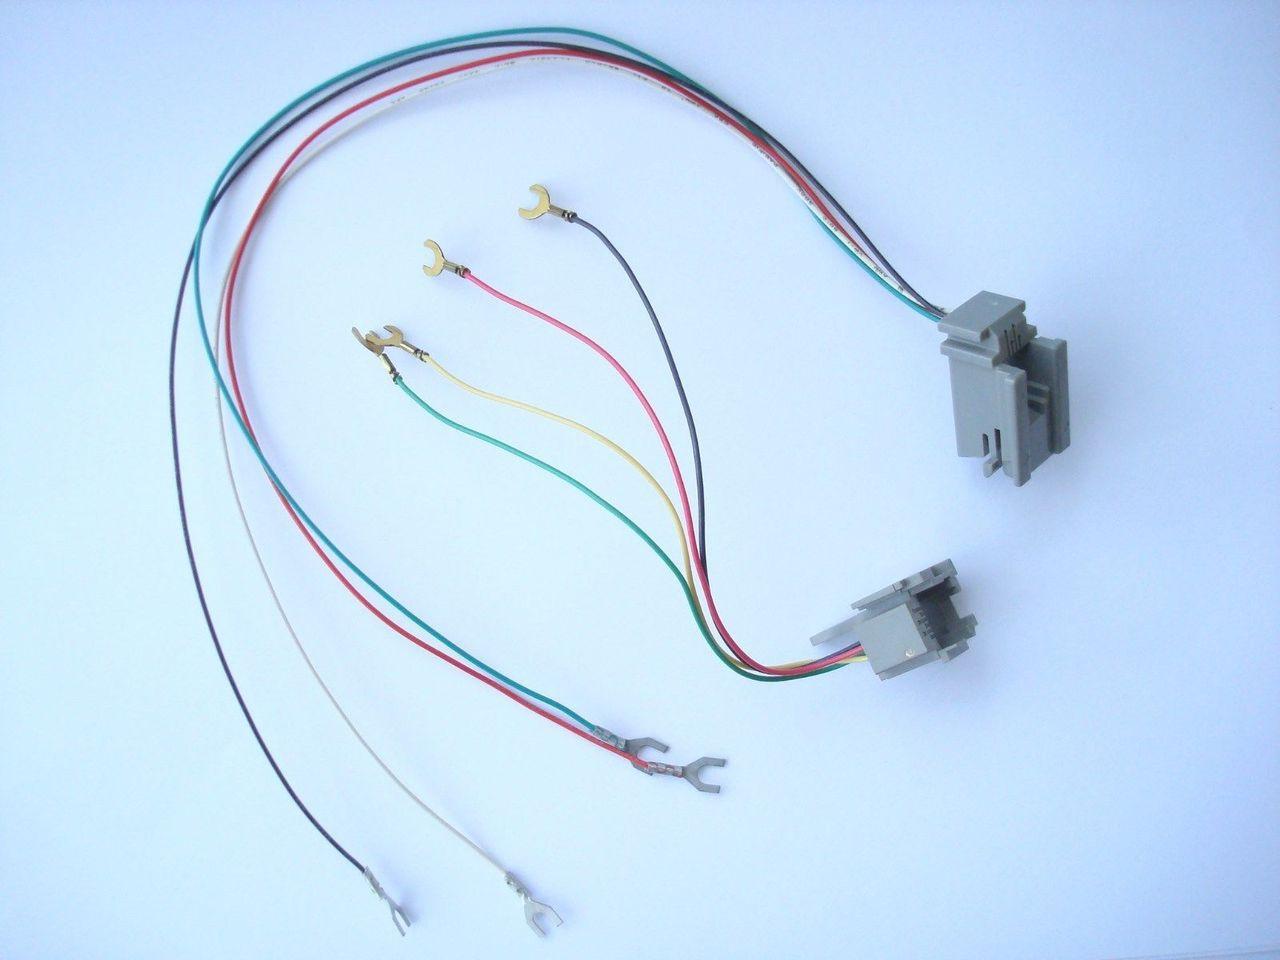 old phone jack wiring diagram 500 and 2500 modular jack set old phone shop store  500 and 2500 modular jack set old